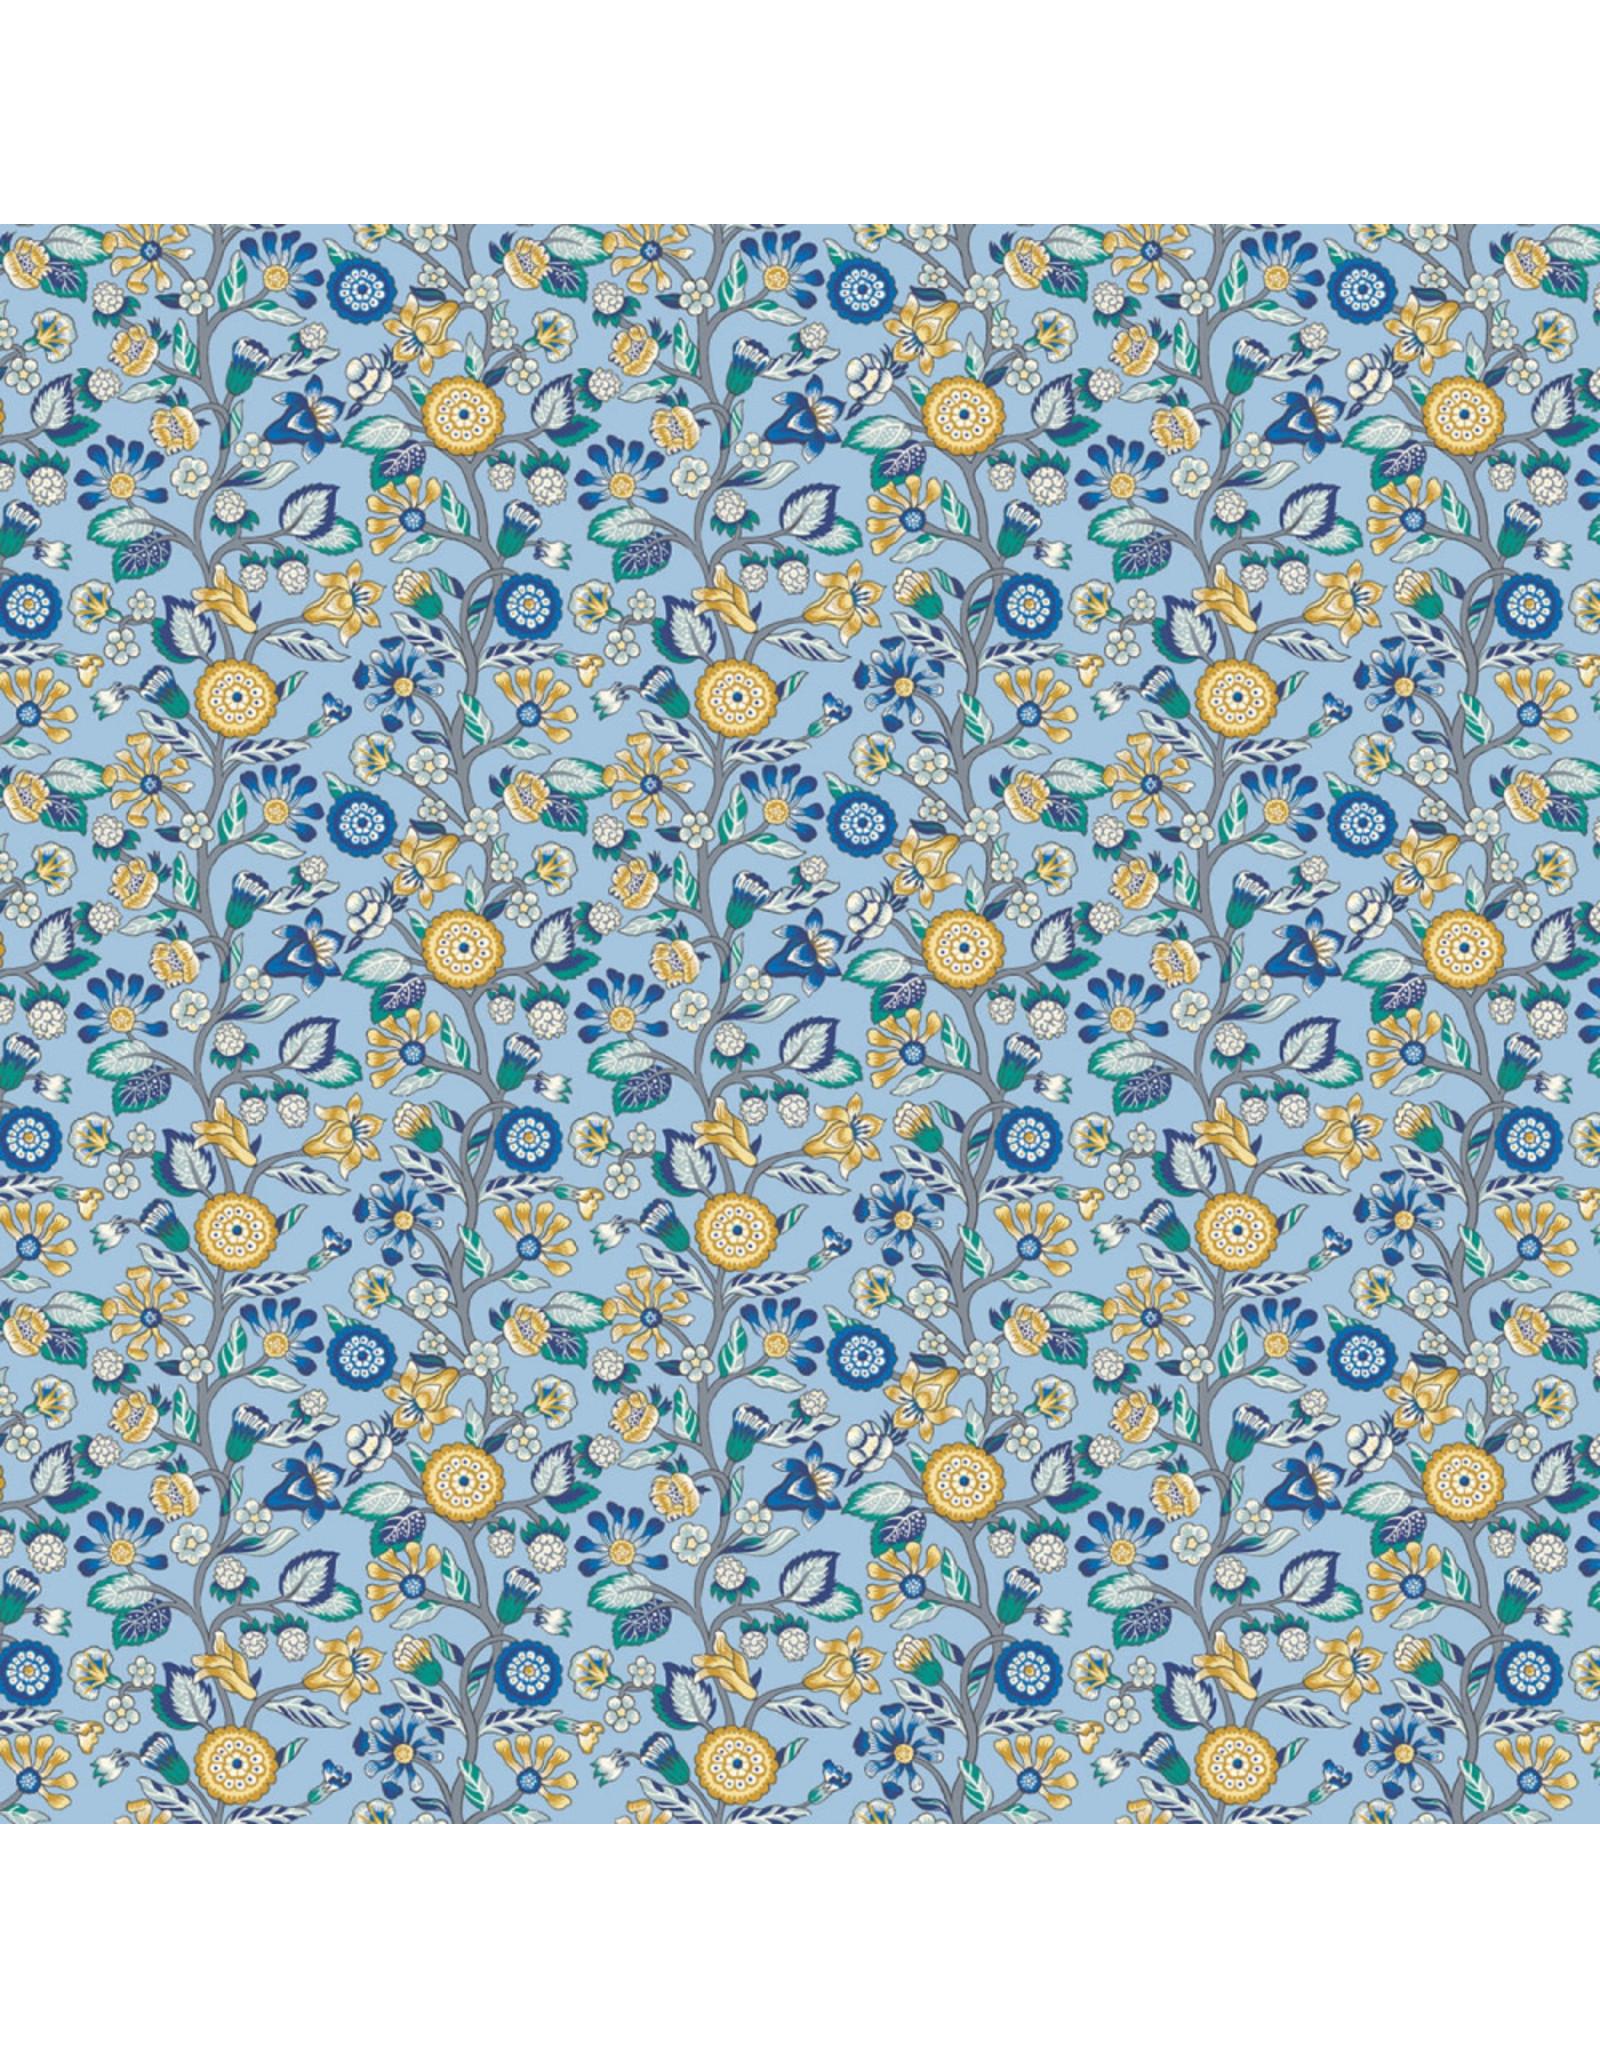 Liberty Fabrics Liberty Emporium,  Merchants Tree C, Fabric Half-Yards